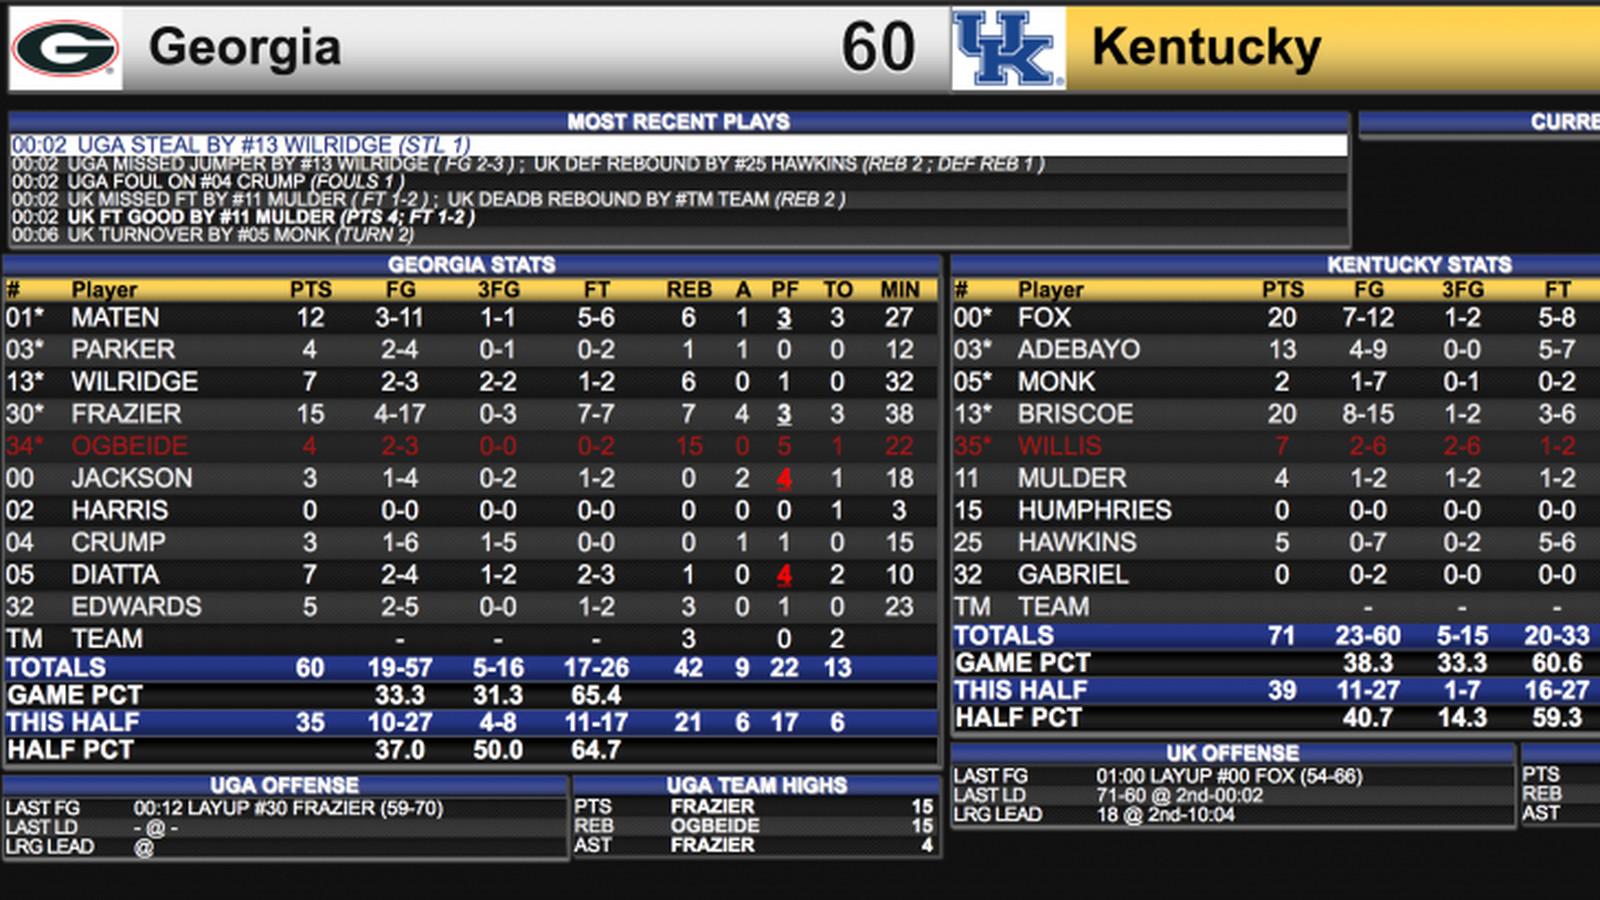 Kentucky Basketball Highlights And Box Score From Historic: Kentucky Whacks Georgia: Highlights, Recap And Box Score